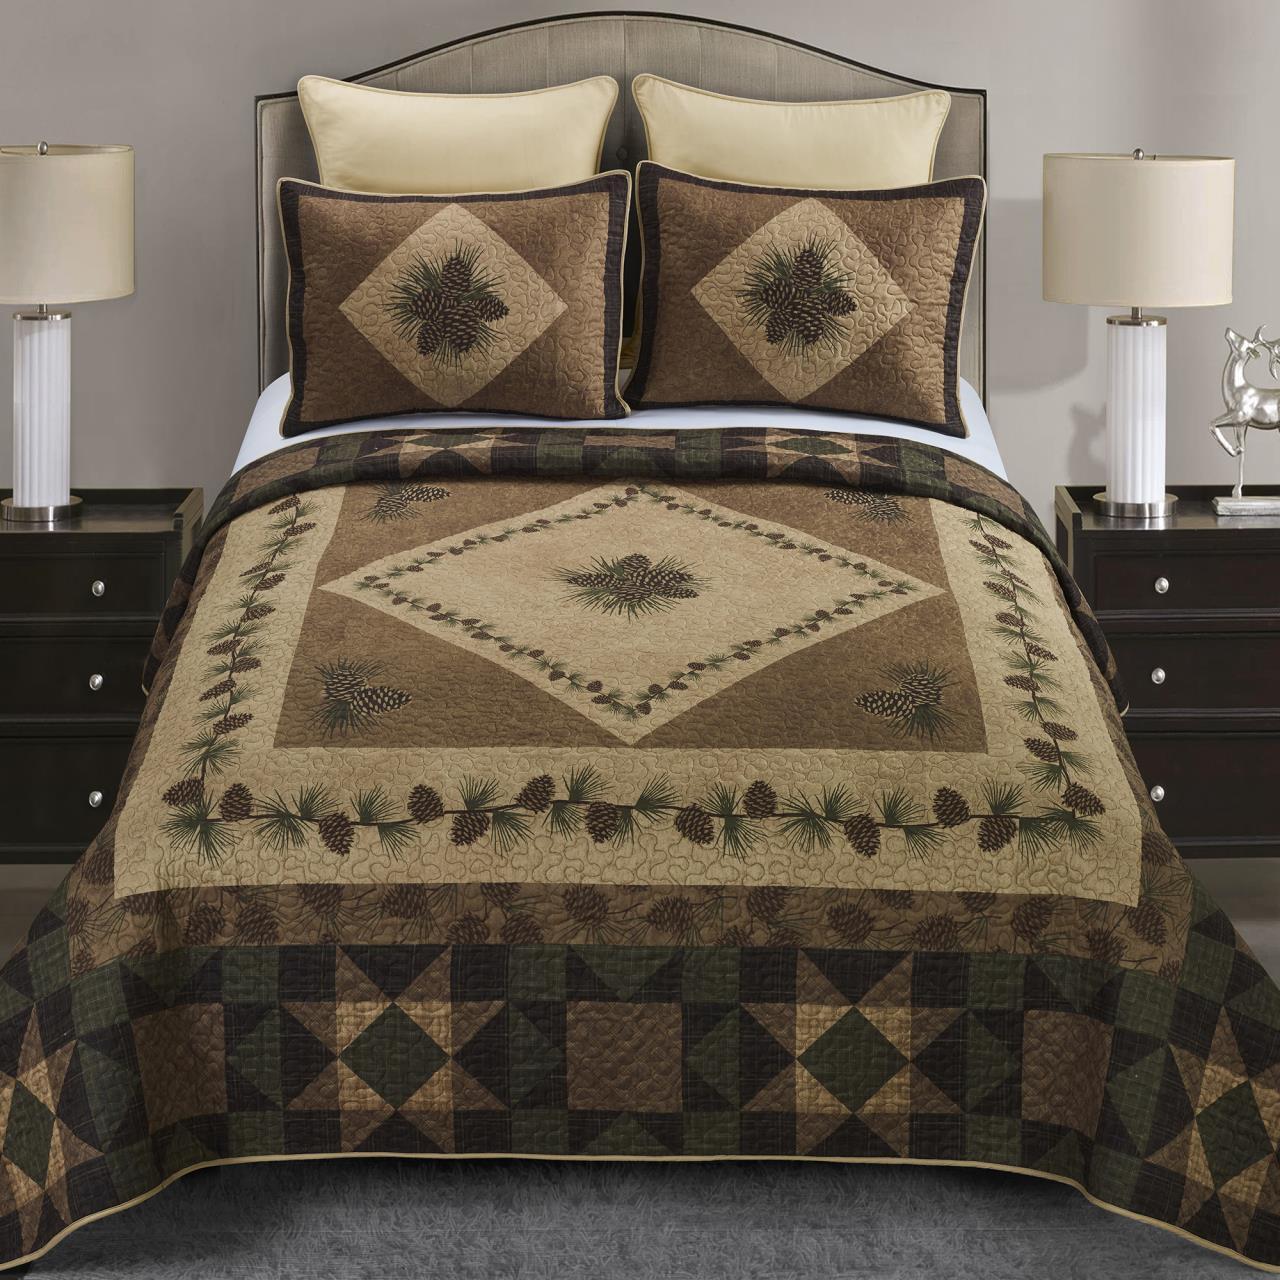 Antique Pine Quilt Collection -